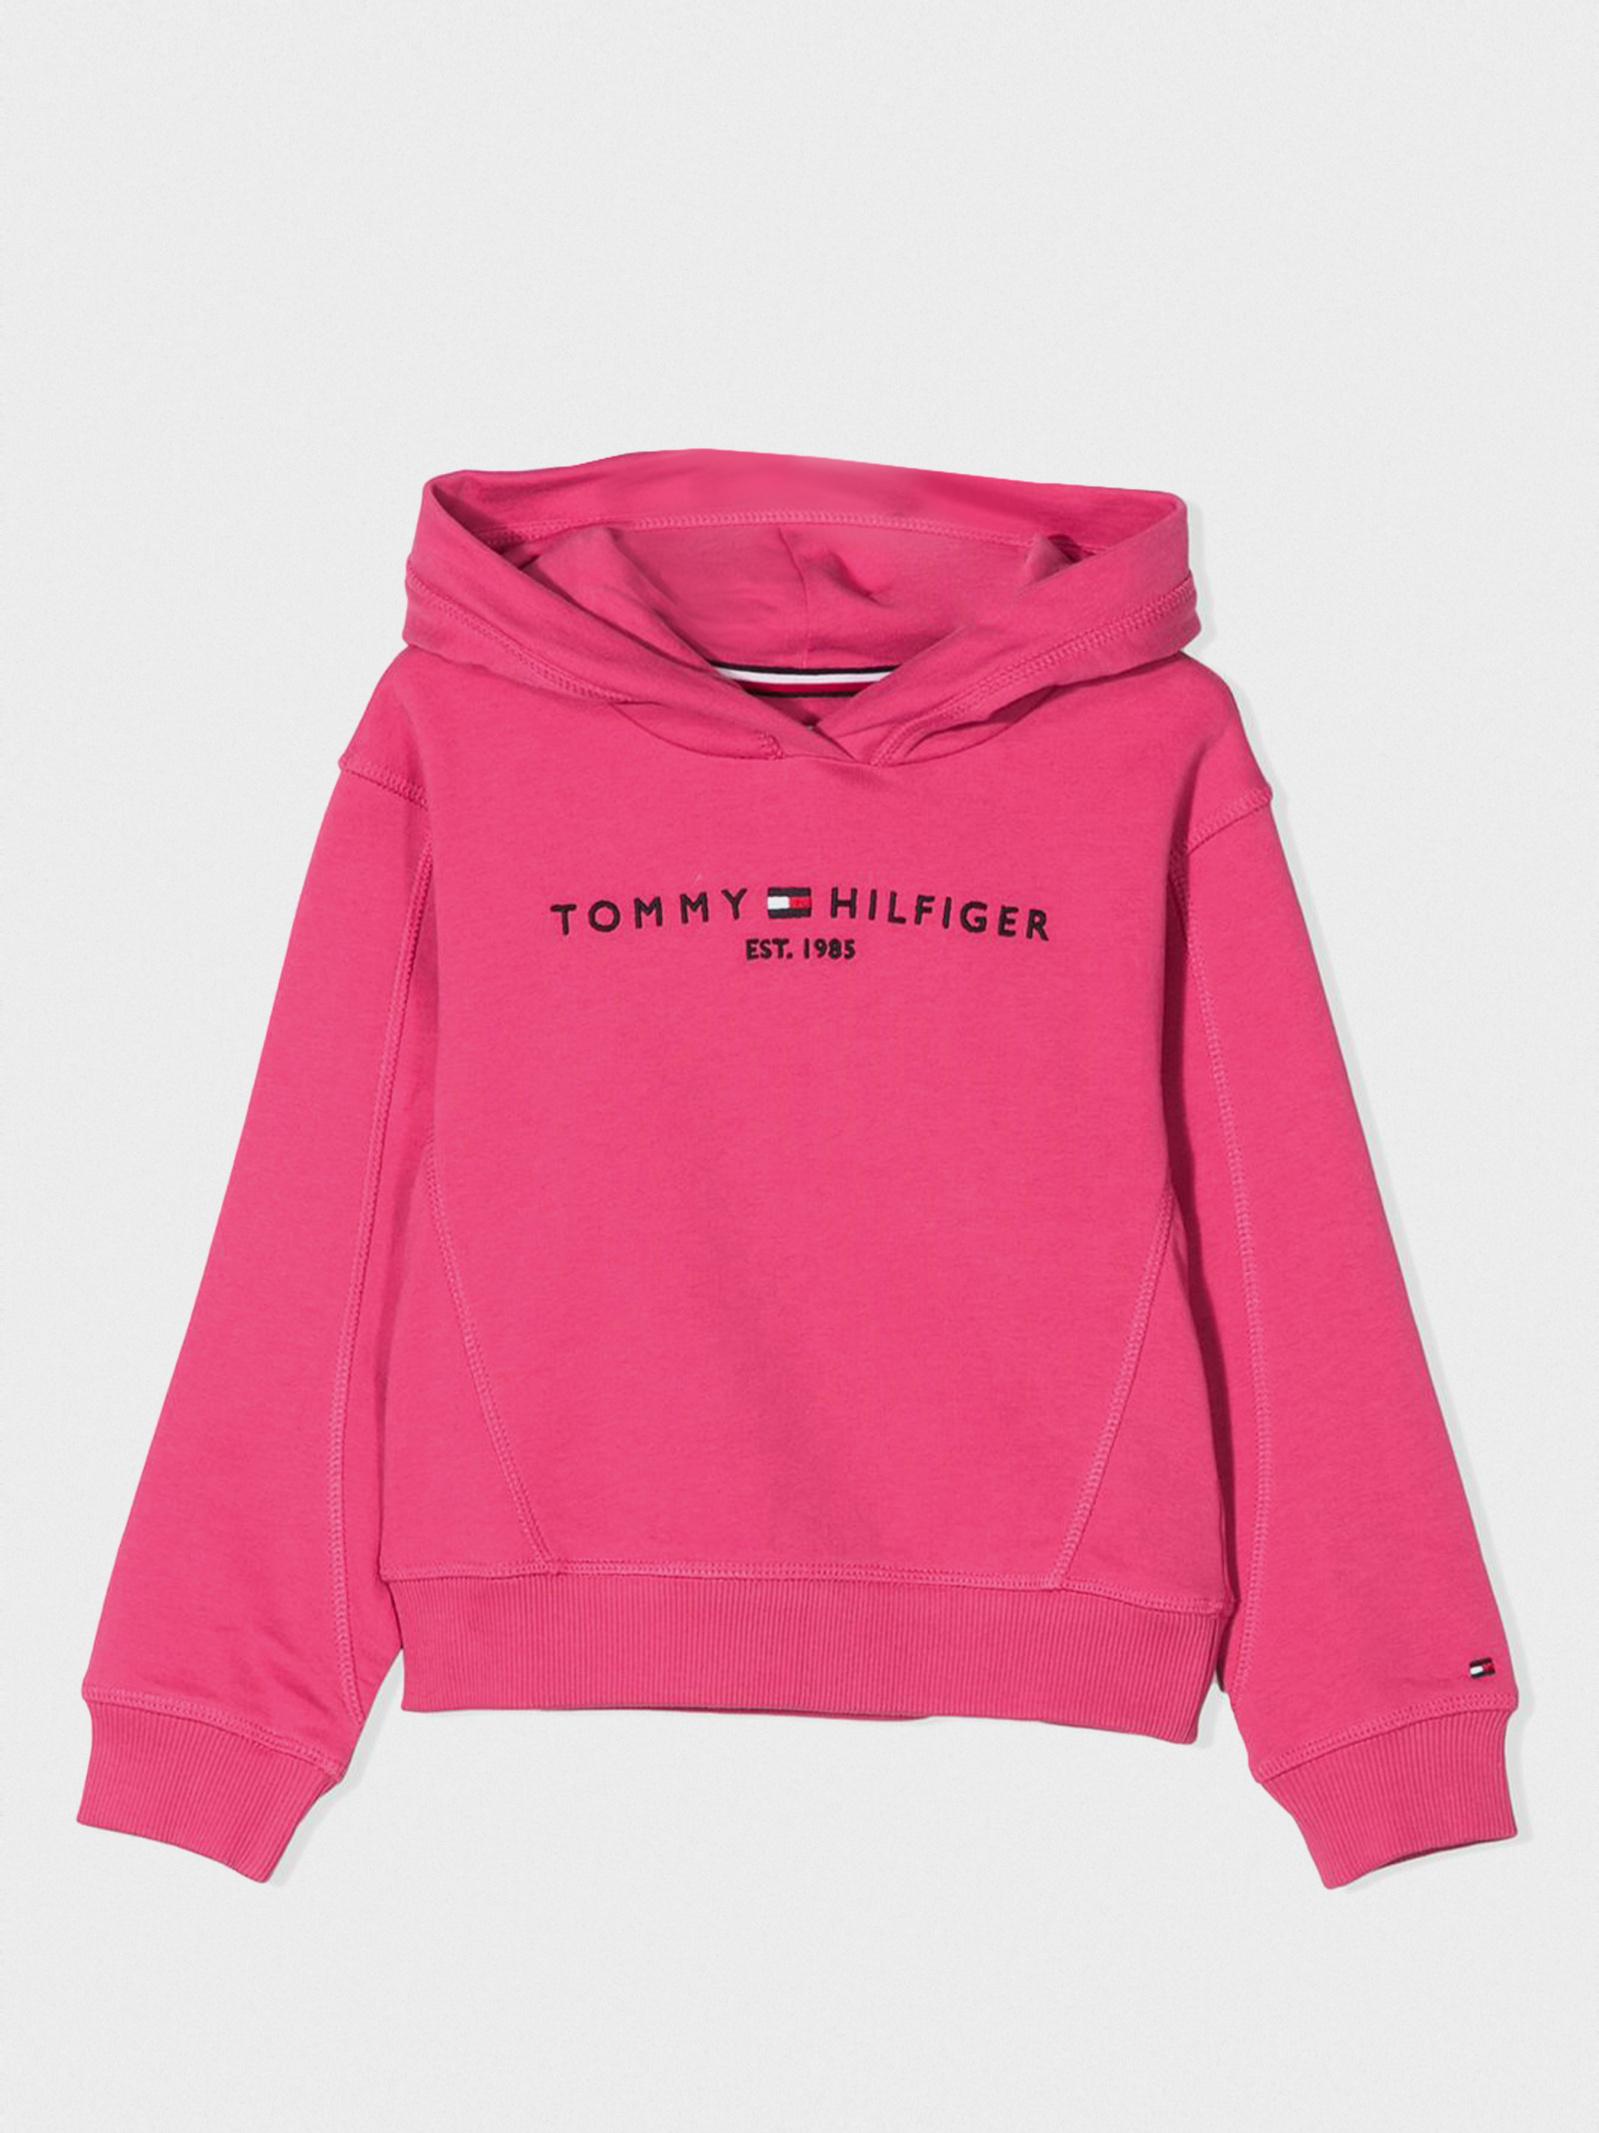 Tommy Hilfiger Кофти та светри дитячі модель KG0KG05042-XIF купити, 2017